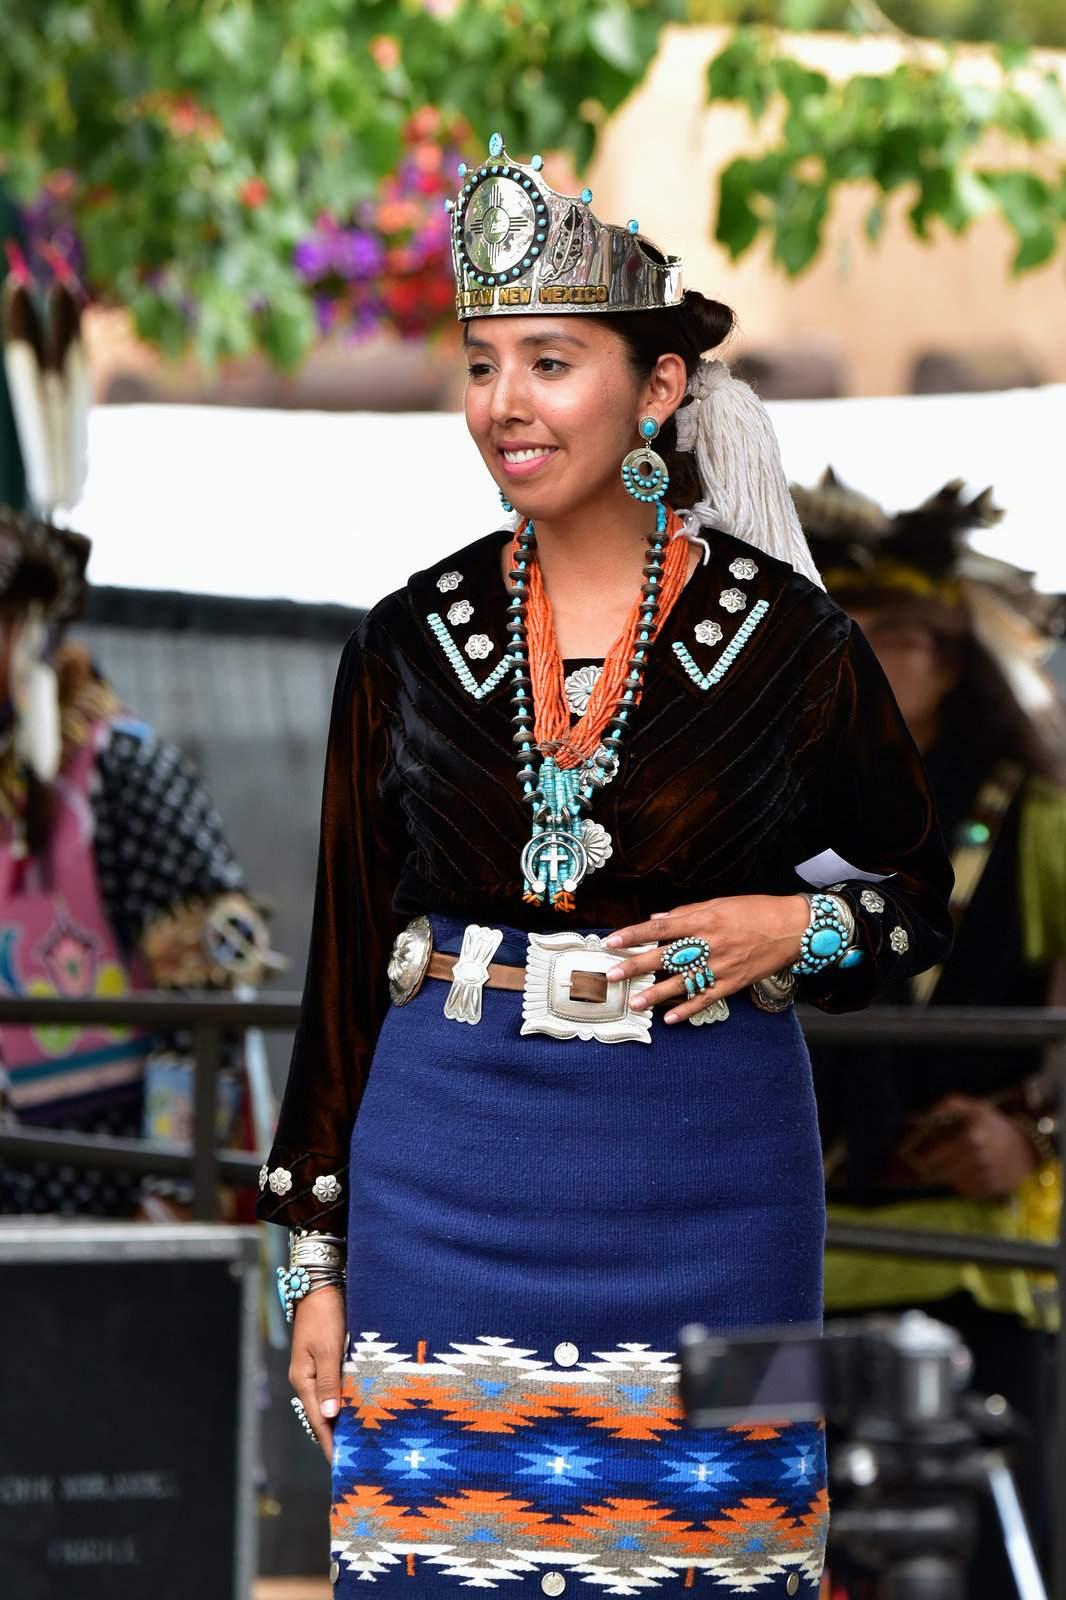 native american clothing7 Native American Clothing Contest at Santa Fe Indian Market